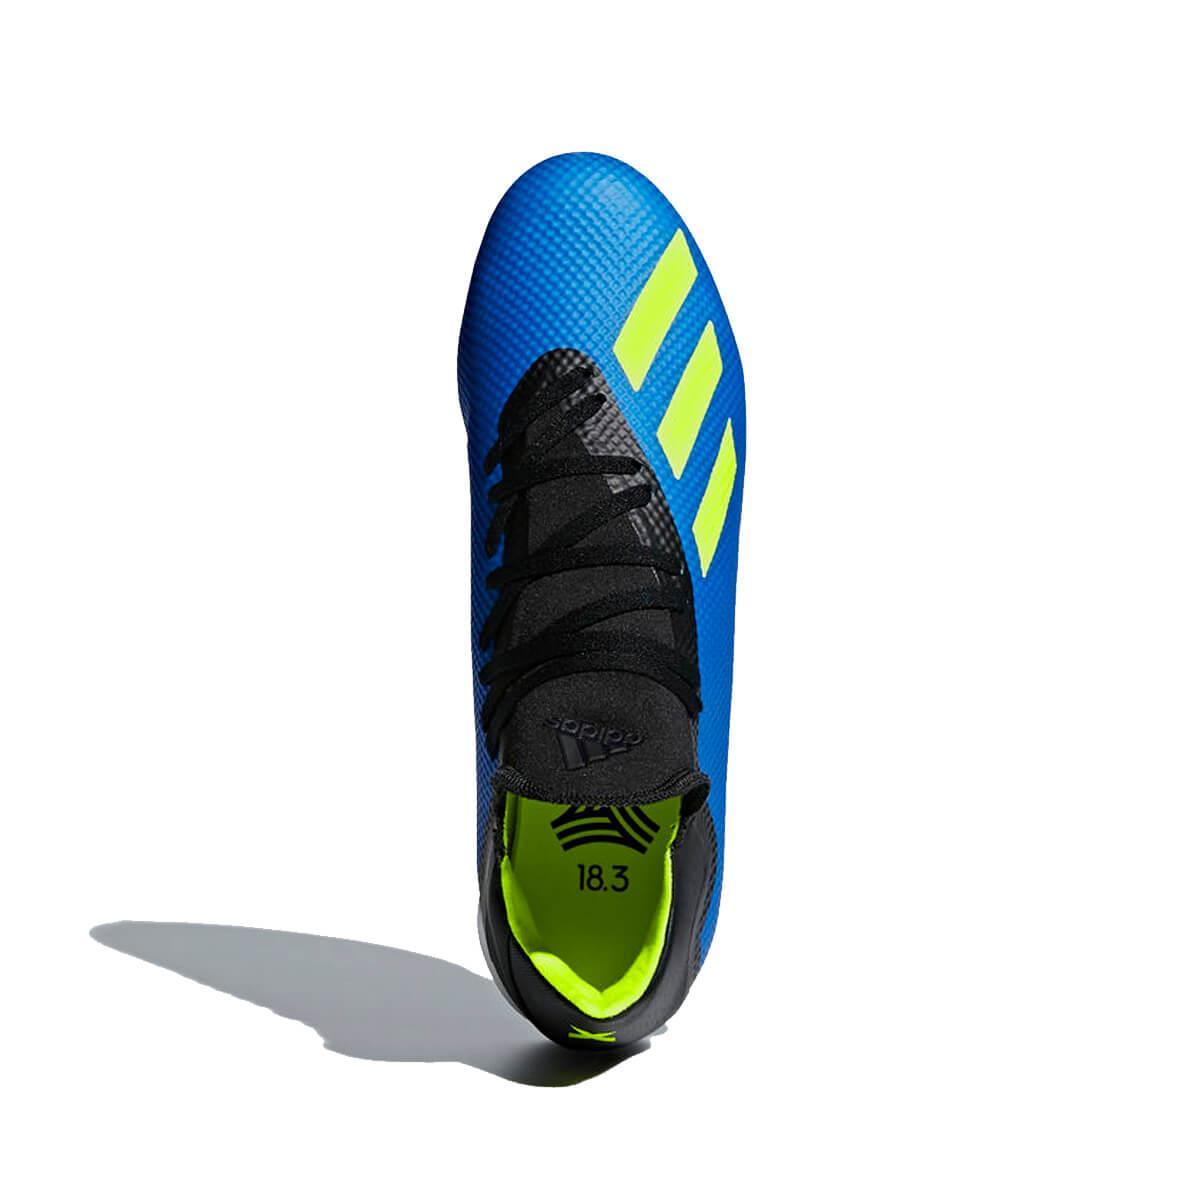 70e3ab9334b39 Chuteira Society Adidas X Tango 18.3 TF